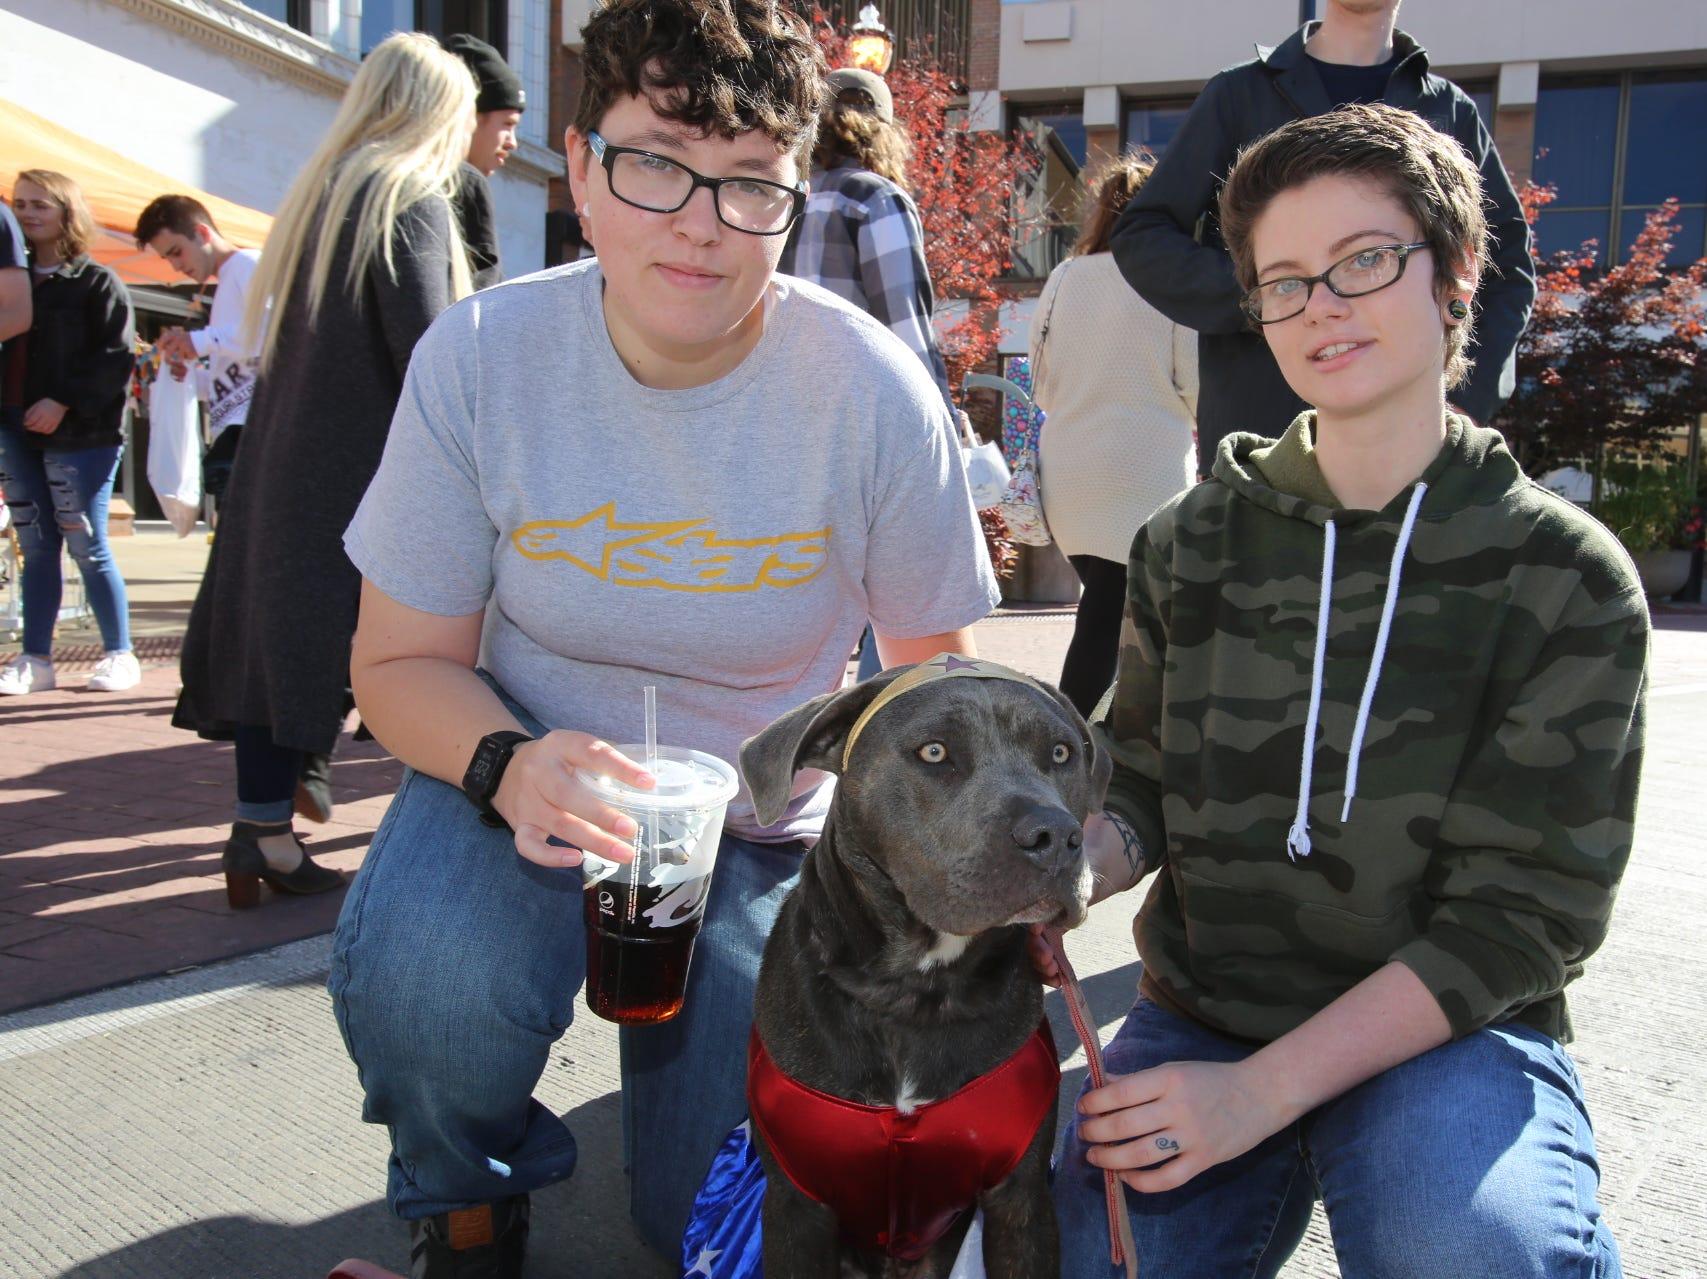 Jessie, Crystal, and Riley Rockman